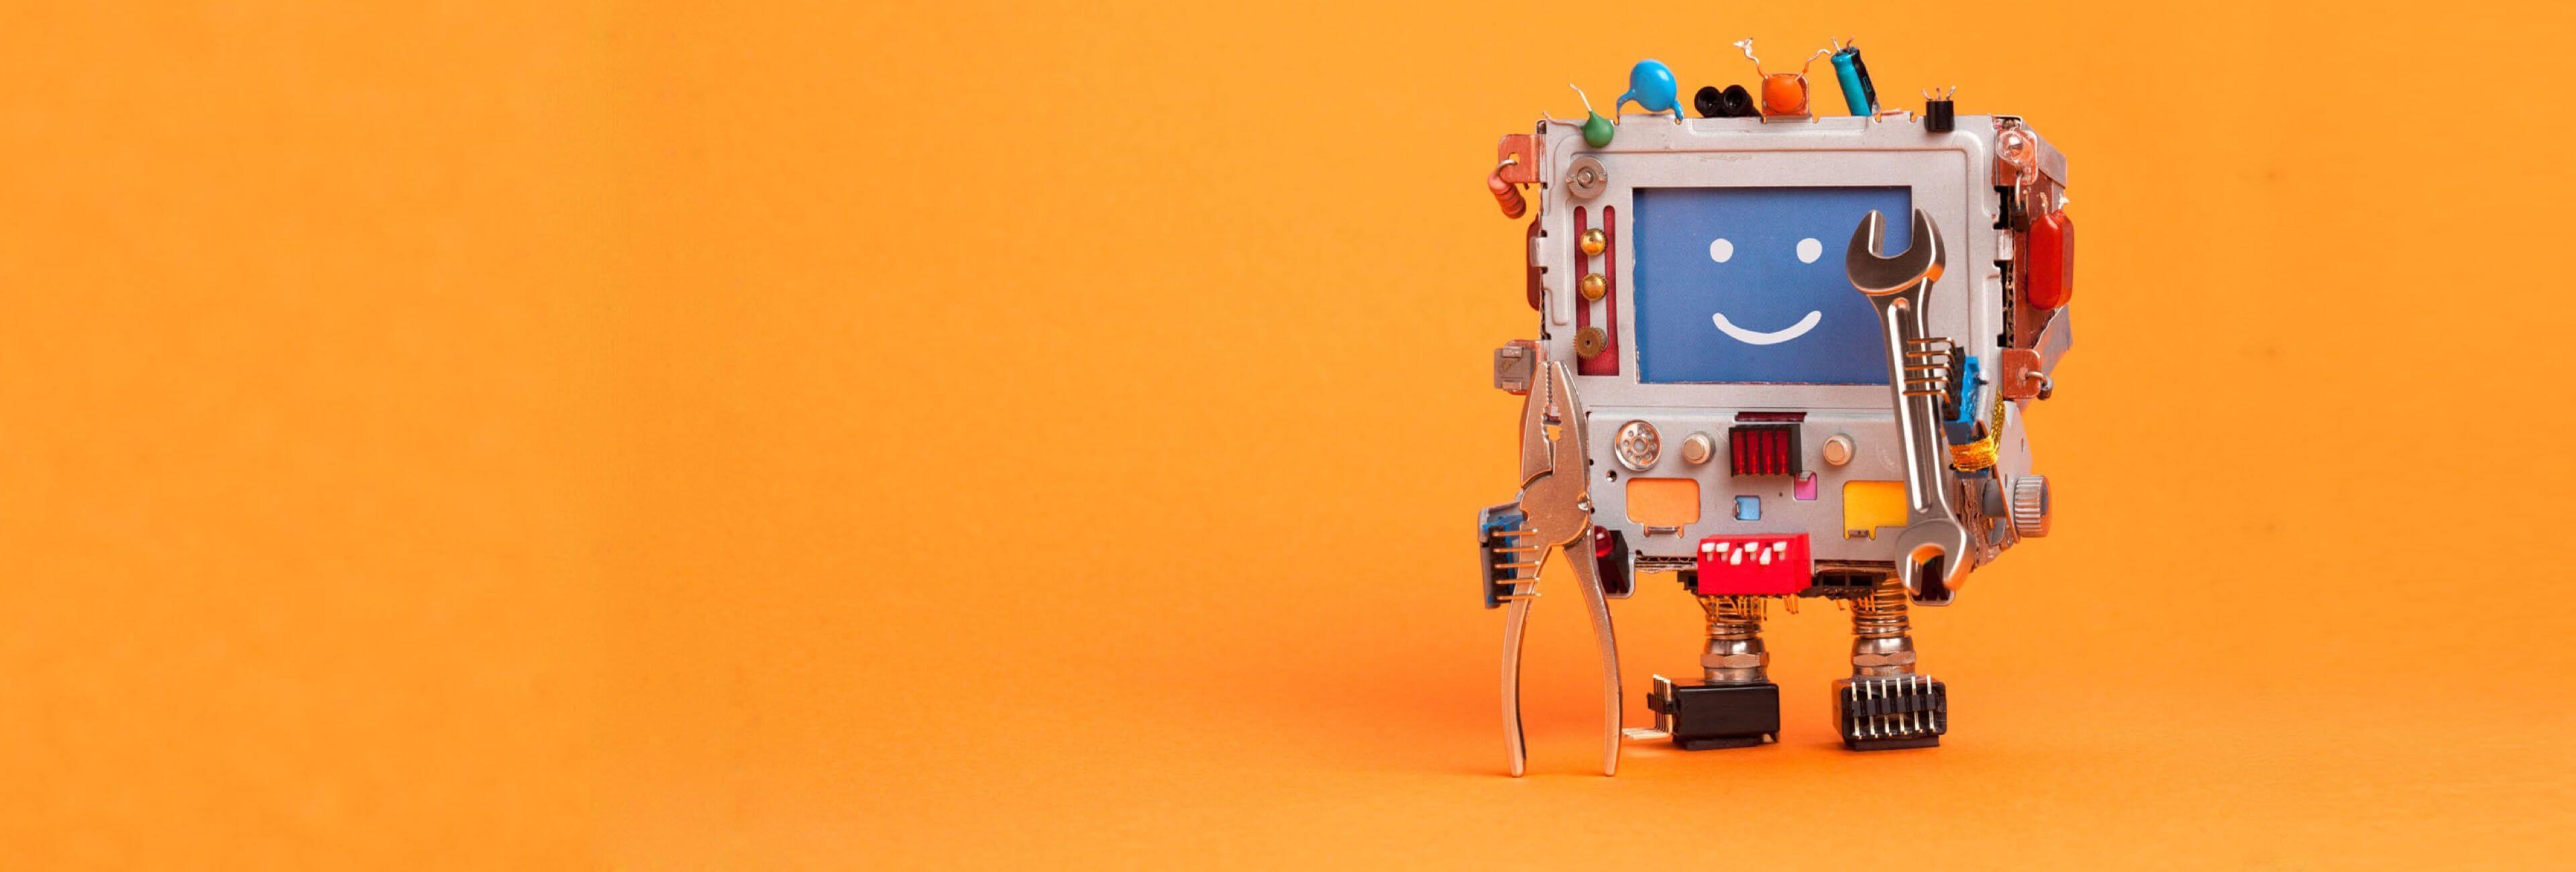 Robotics in Finance